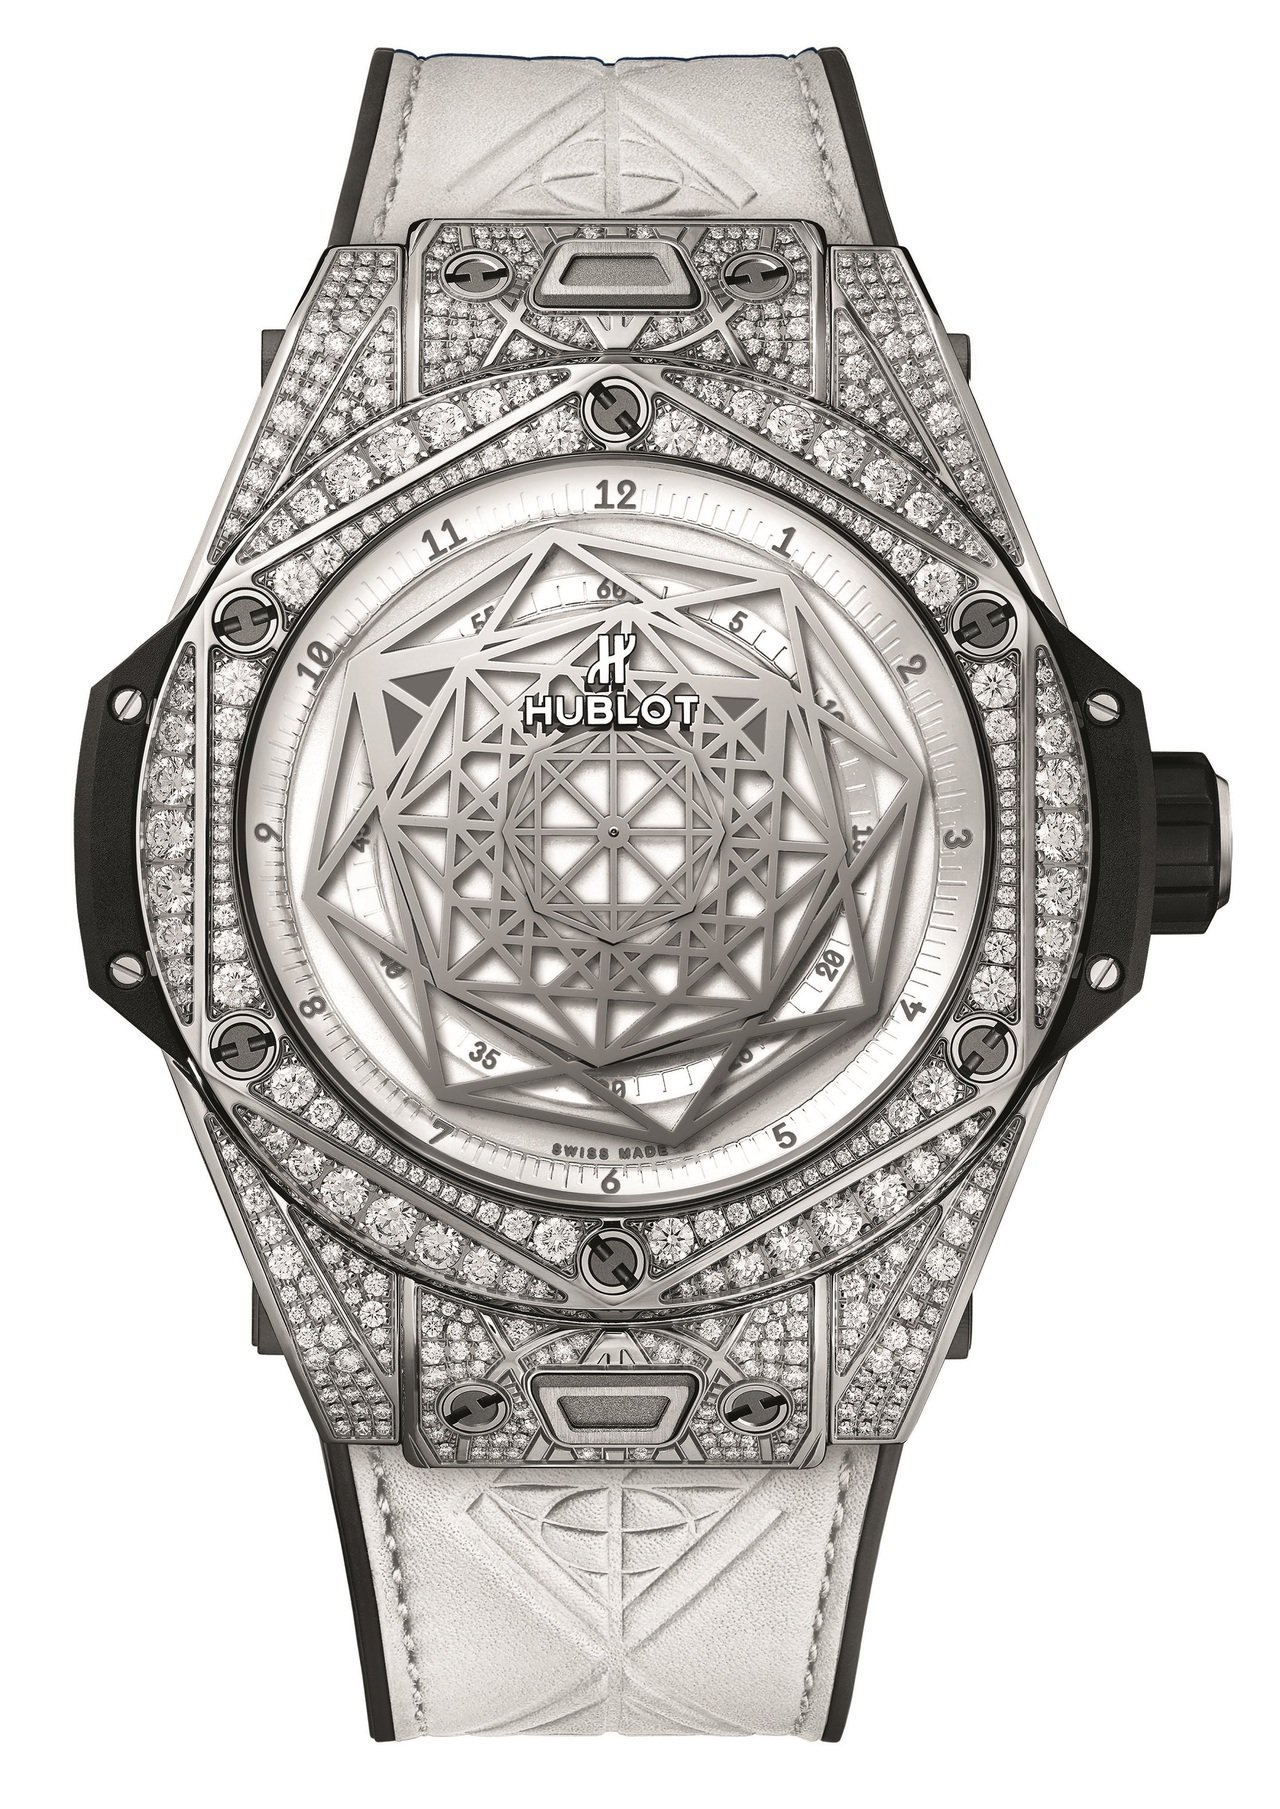 Big Bang Unico Sang Bleu白色滿鑽腕表,售價115萬8千元...